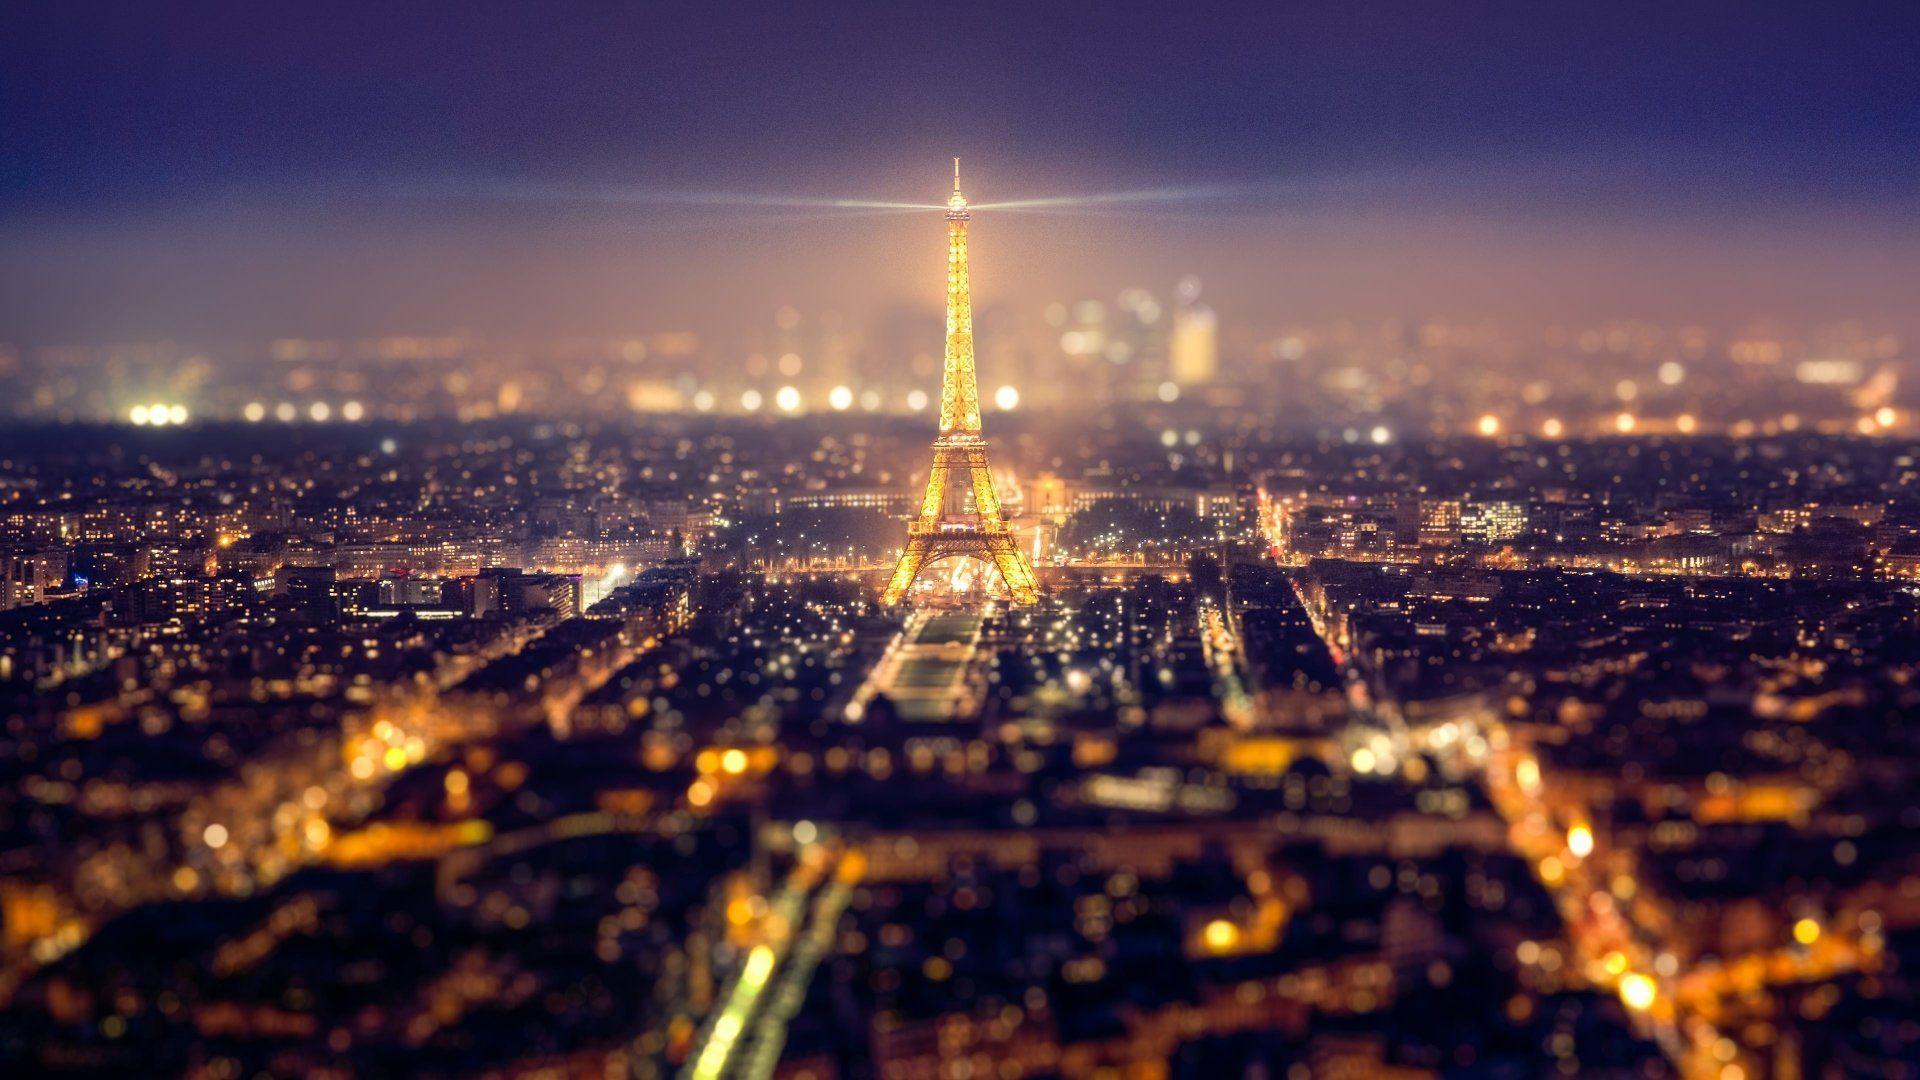 Paris 4k Wallpapers Top Free Paris 4k Backgrounds Wallpaperaccess